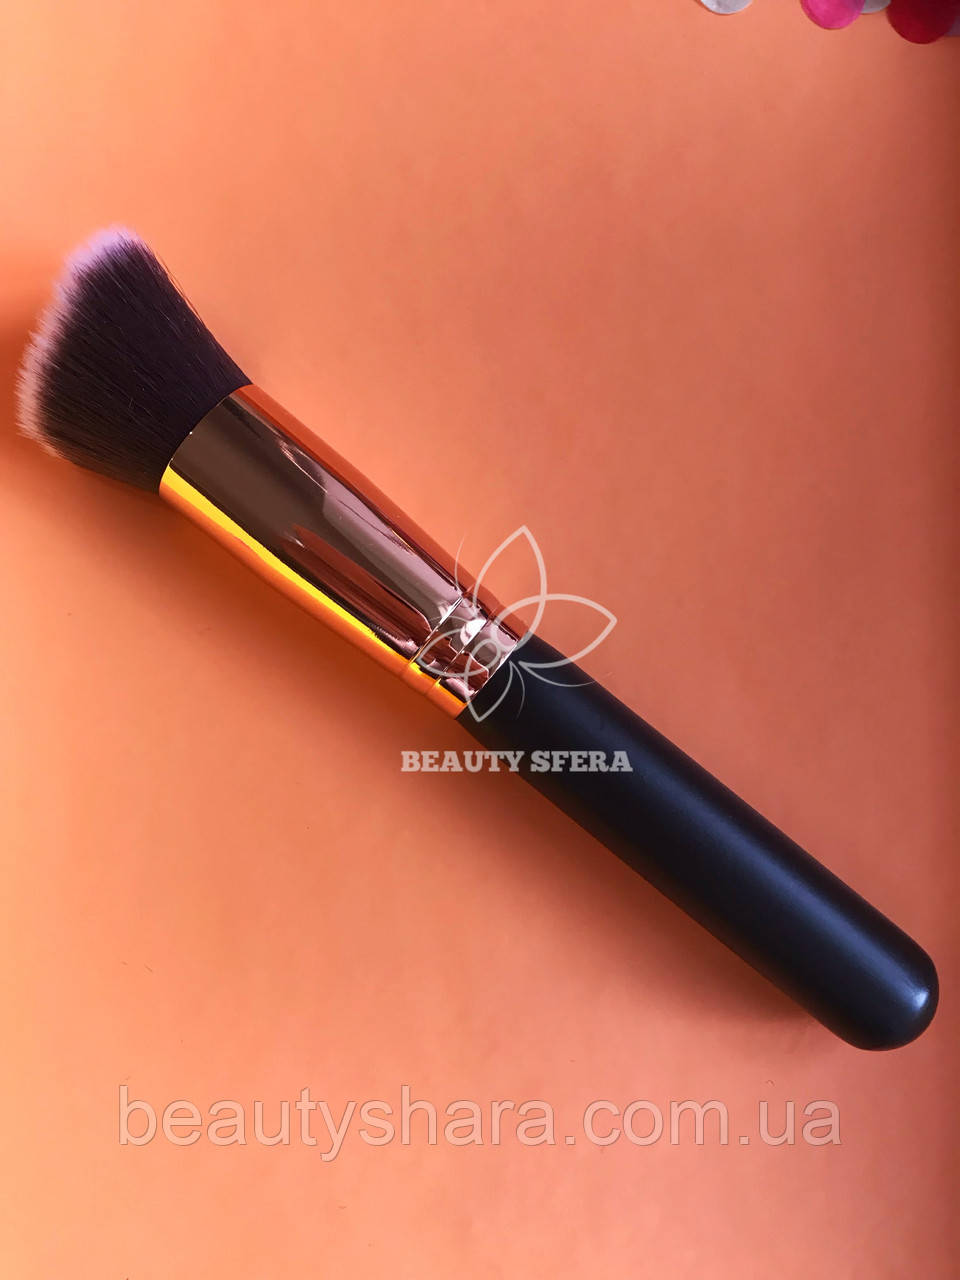 Кисть для макияжа Zoeva №103 Defined Buffer